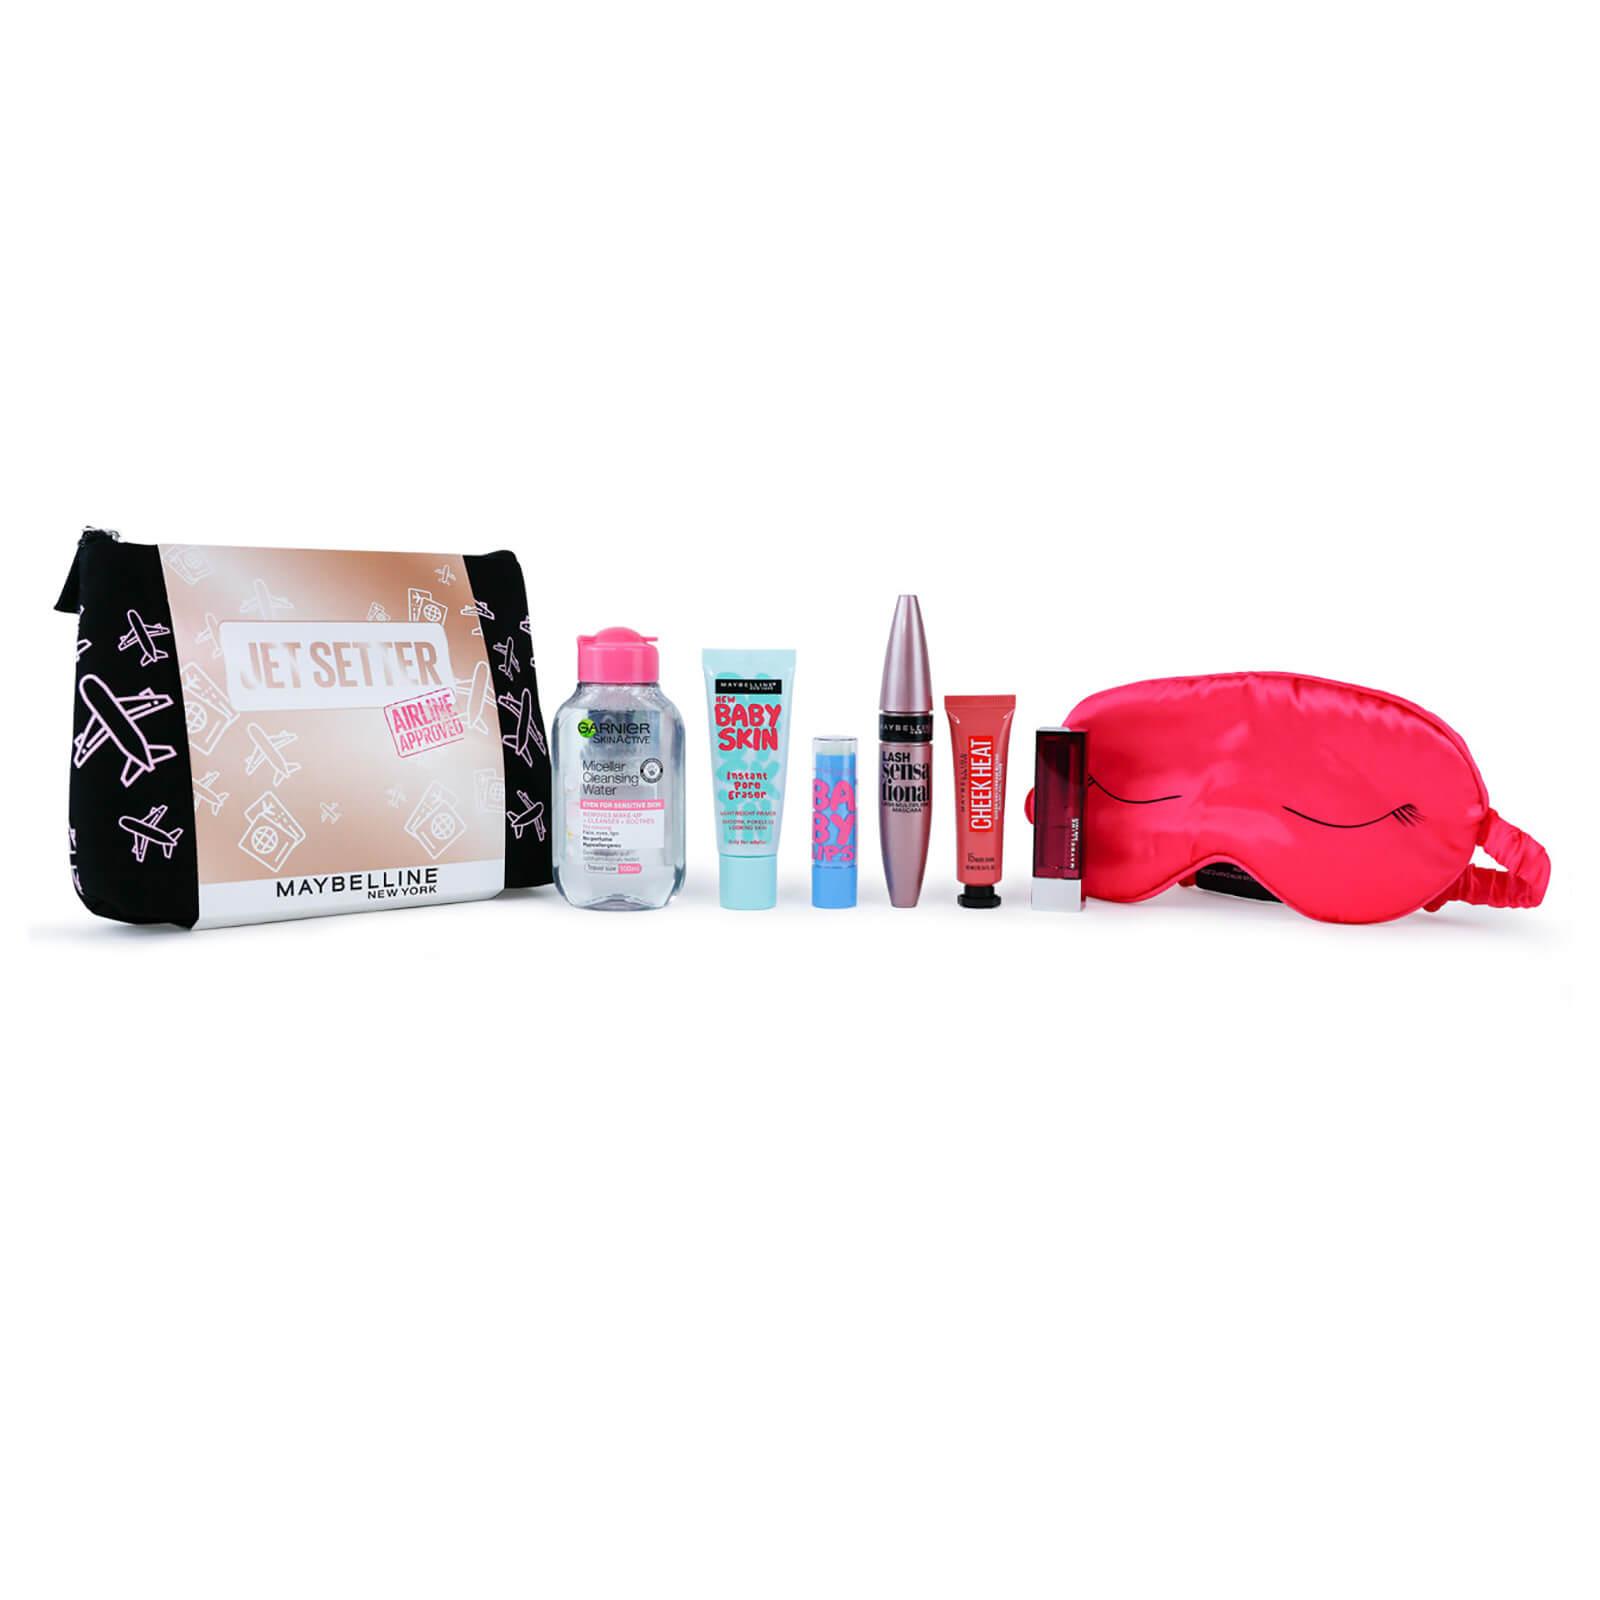 Maybelline Makeup Jet Setter Gift Set Travel Kit for Her (Worth £40.00)